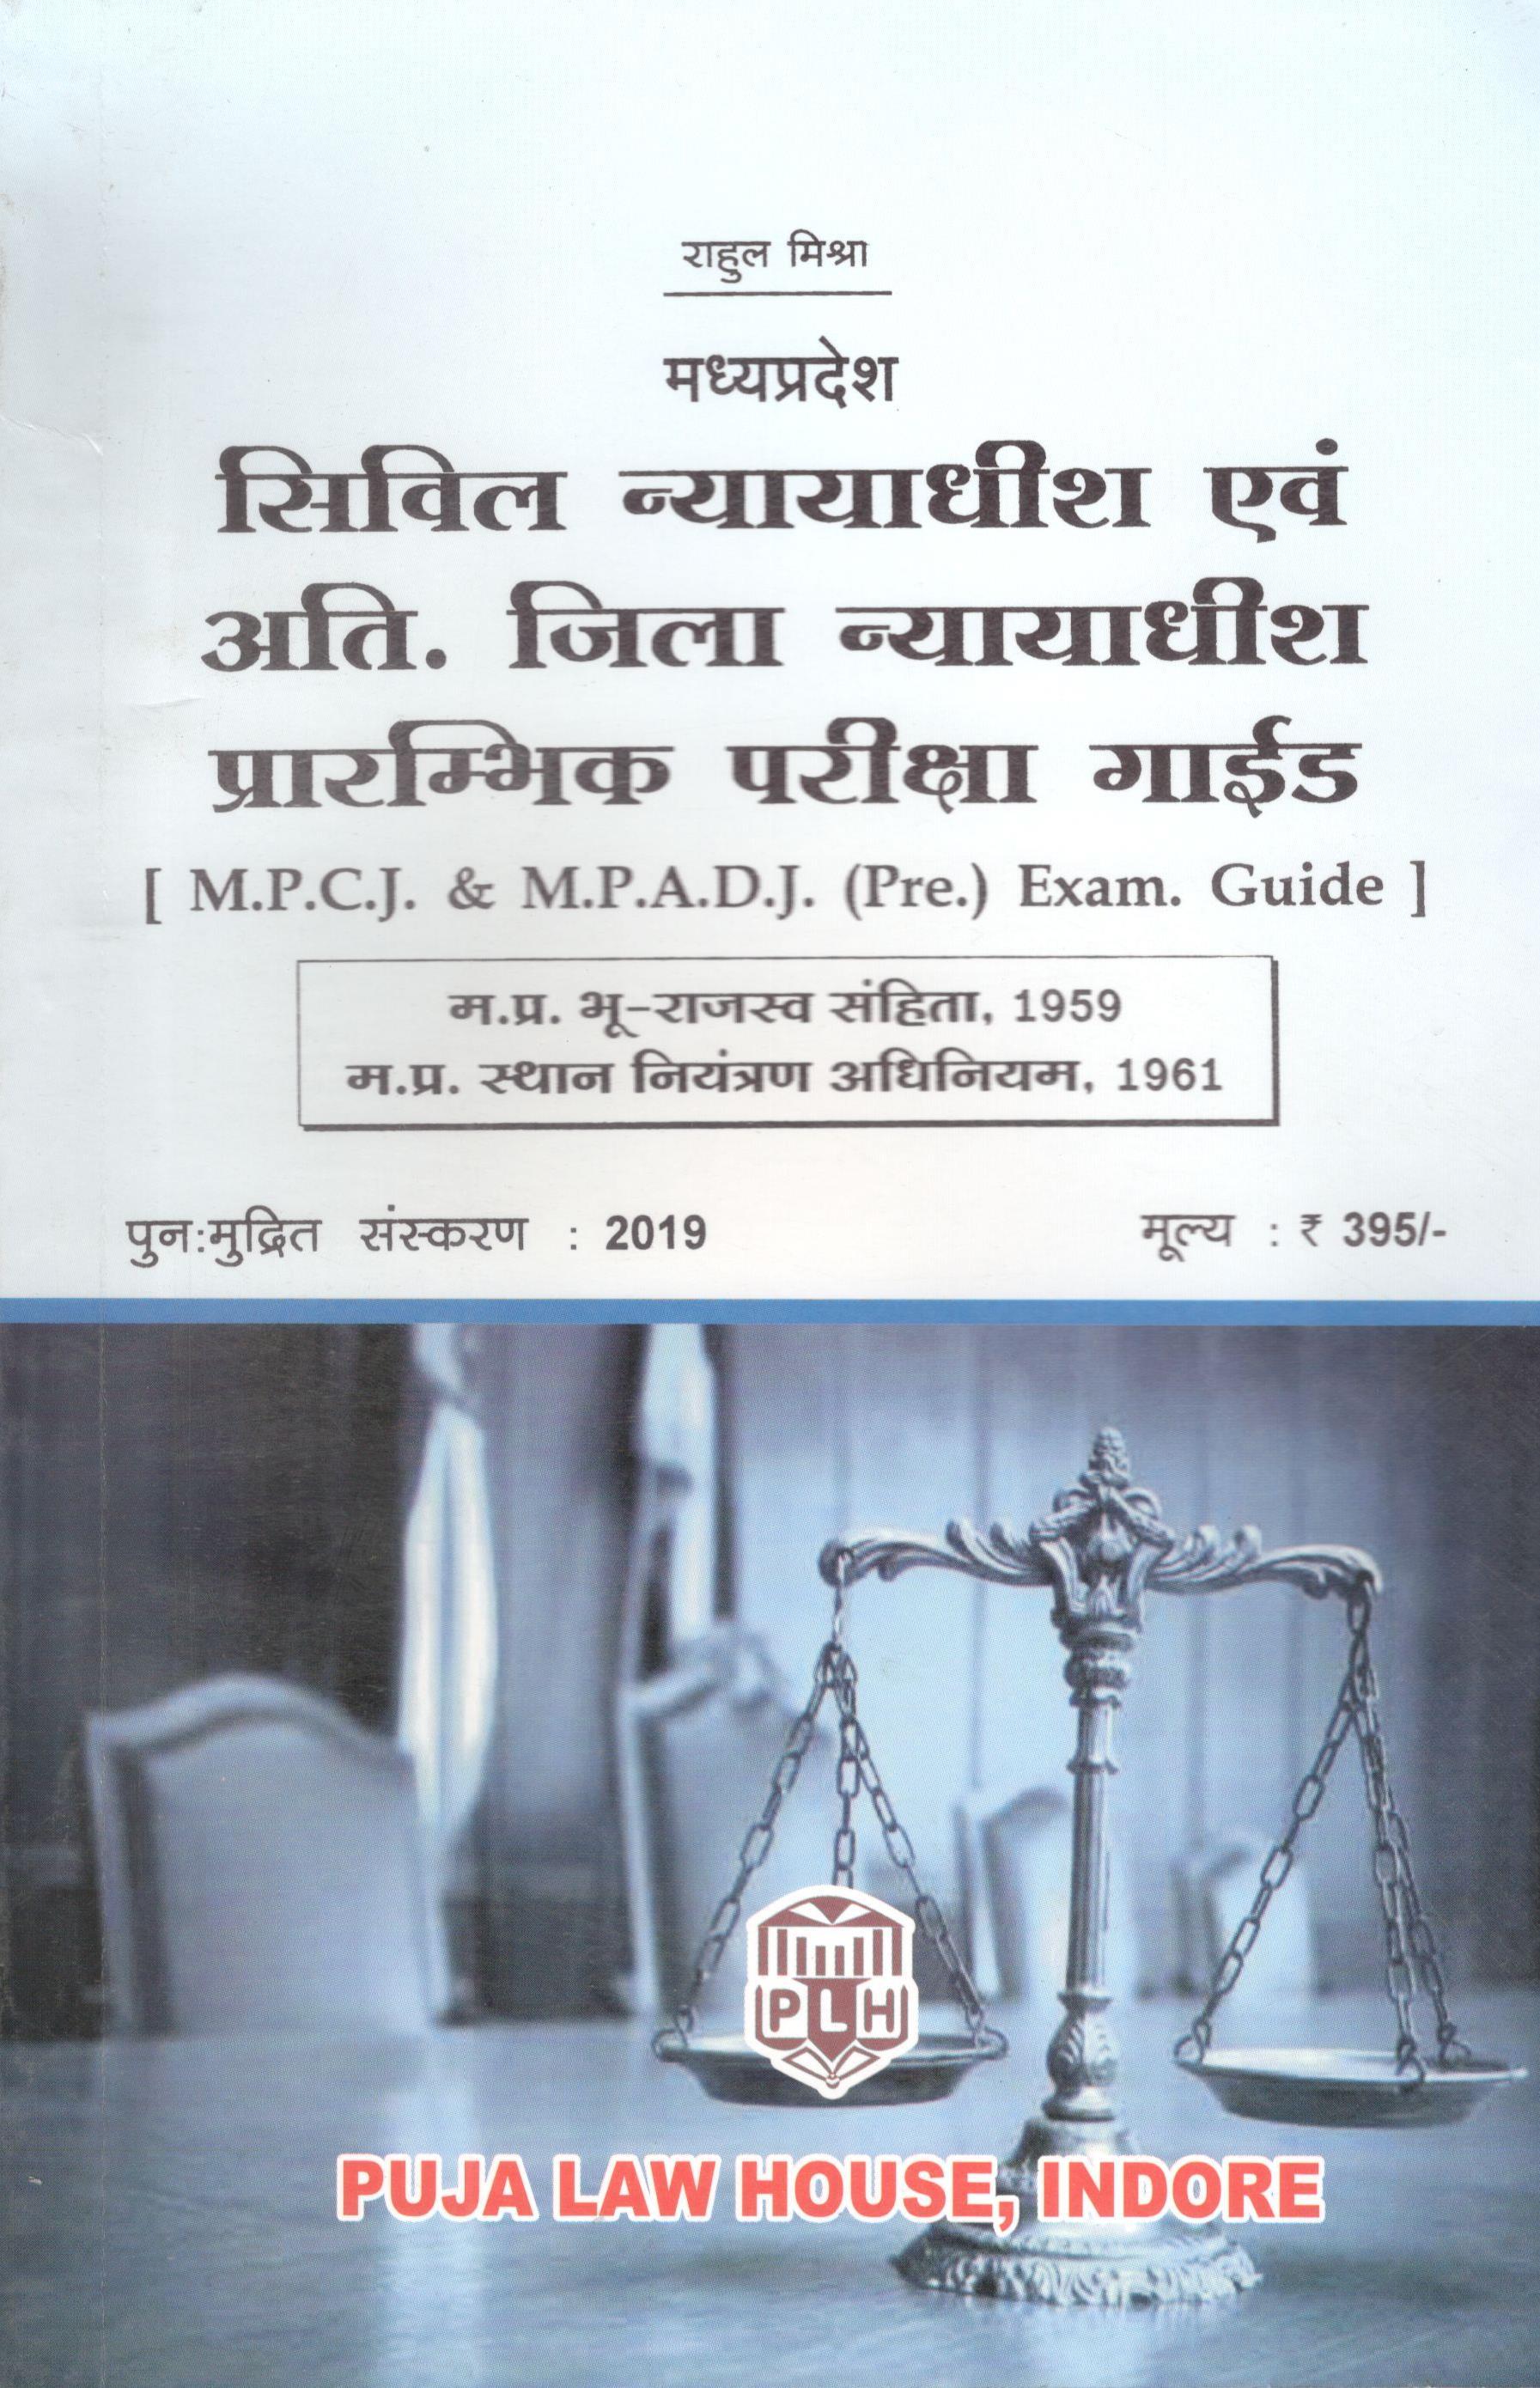 राहुल मिश्रा - माइनर एक्ट्स (भू-राजस्व संहिता, 1959  एवं स्थान नियंत्रण अधिनियम, 1961) / Minor Acts (Land Revenue Code, 1959 and  Accommodation Control Act, 1961)